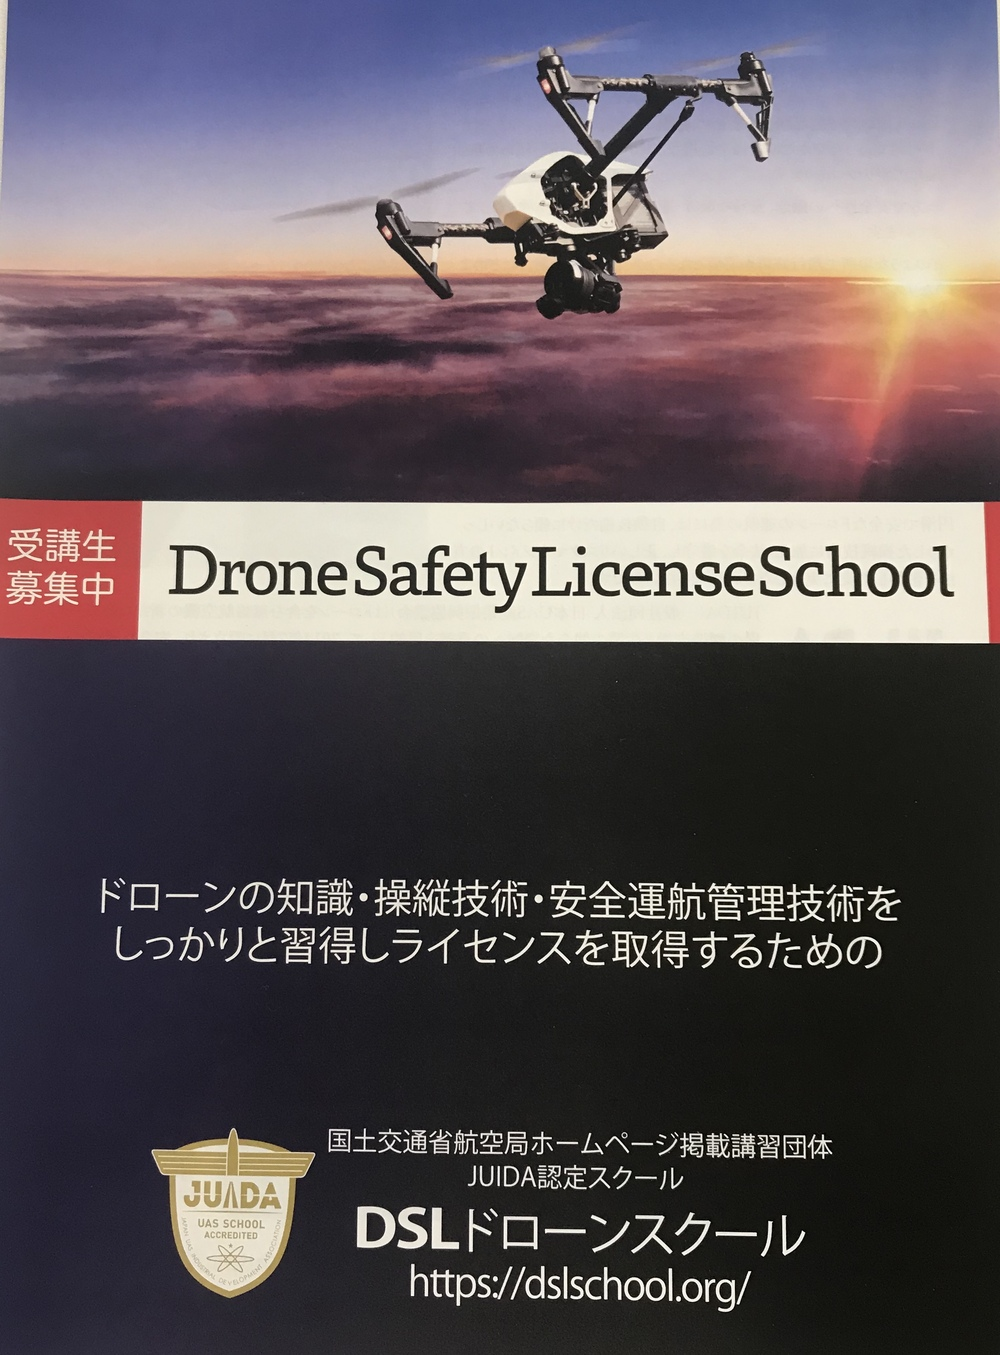 JUIDA 10 月コース(3日間にて、JUIDA認定操縦士資格を取得可能)